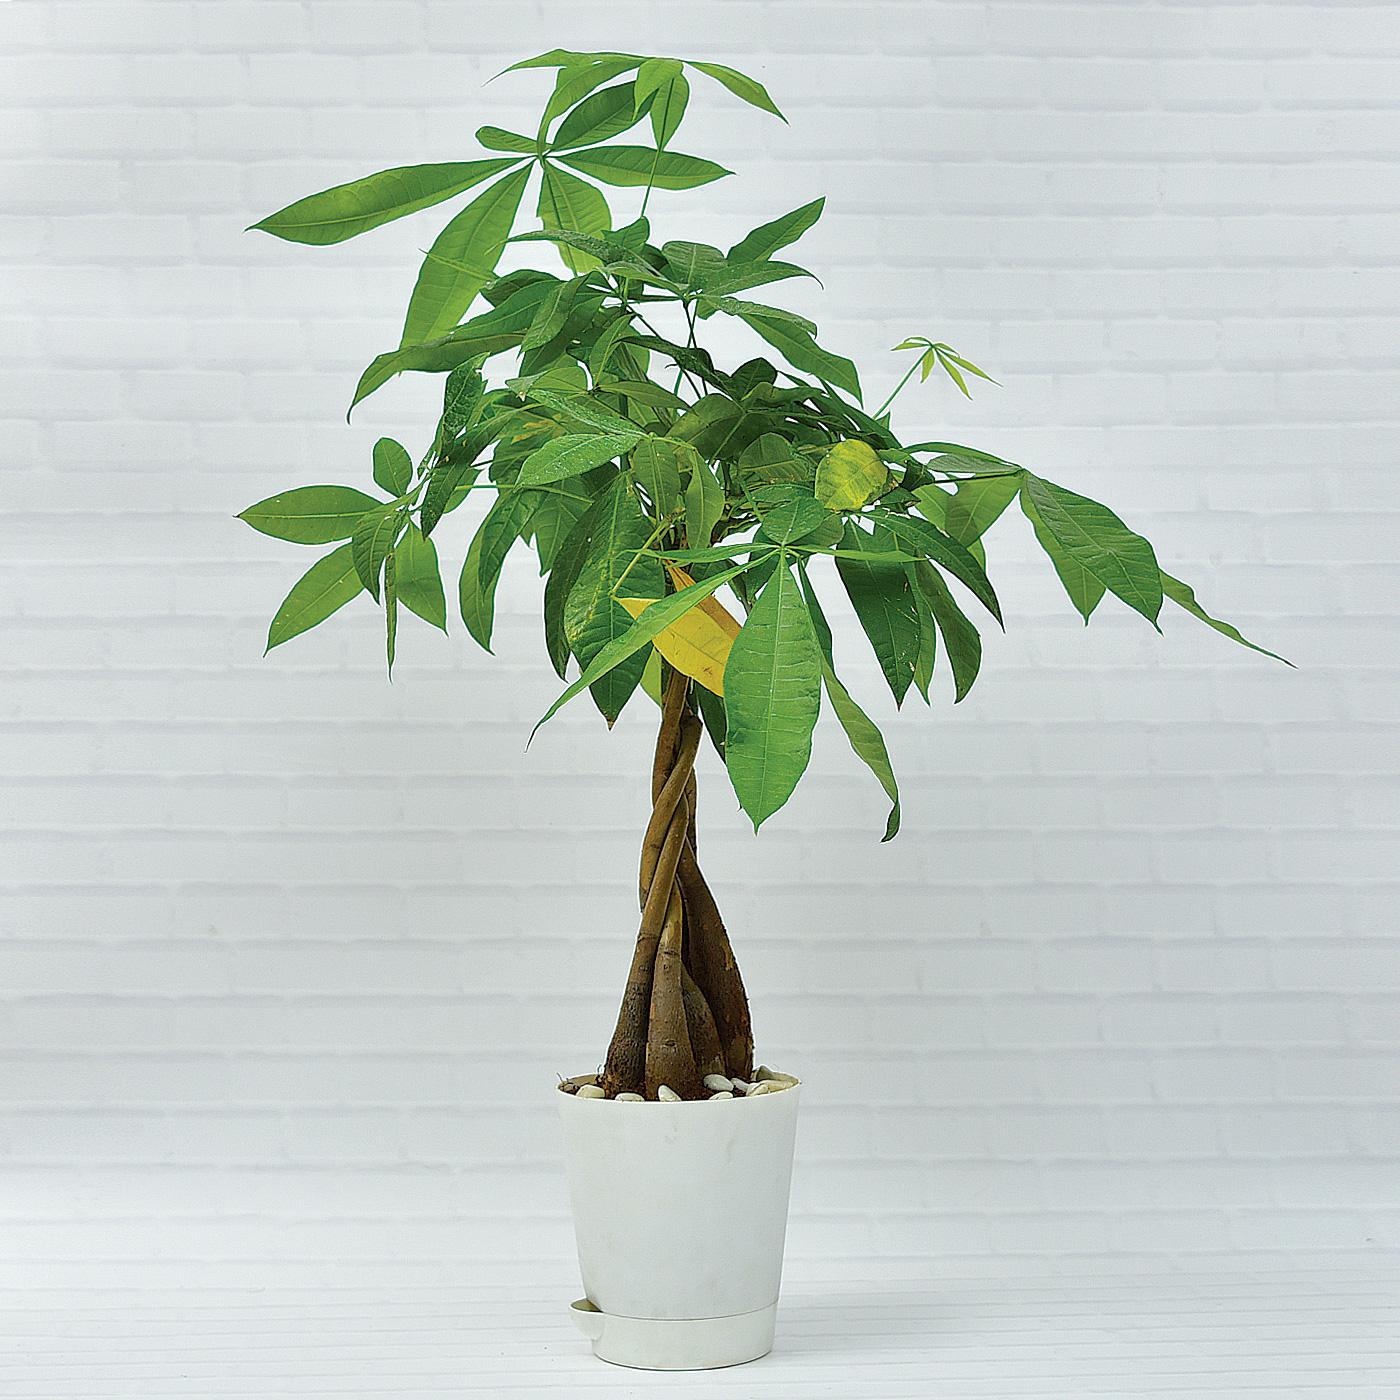 Braided-Malabar-Chestnut-Pachira-Bonsai-Money-Tree-Plant